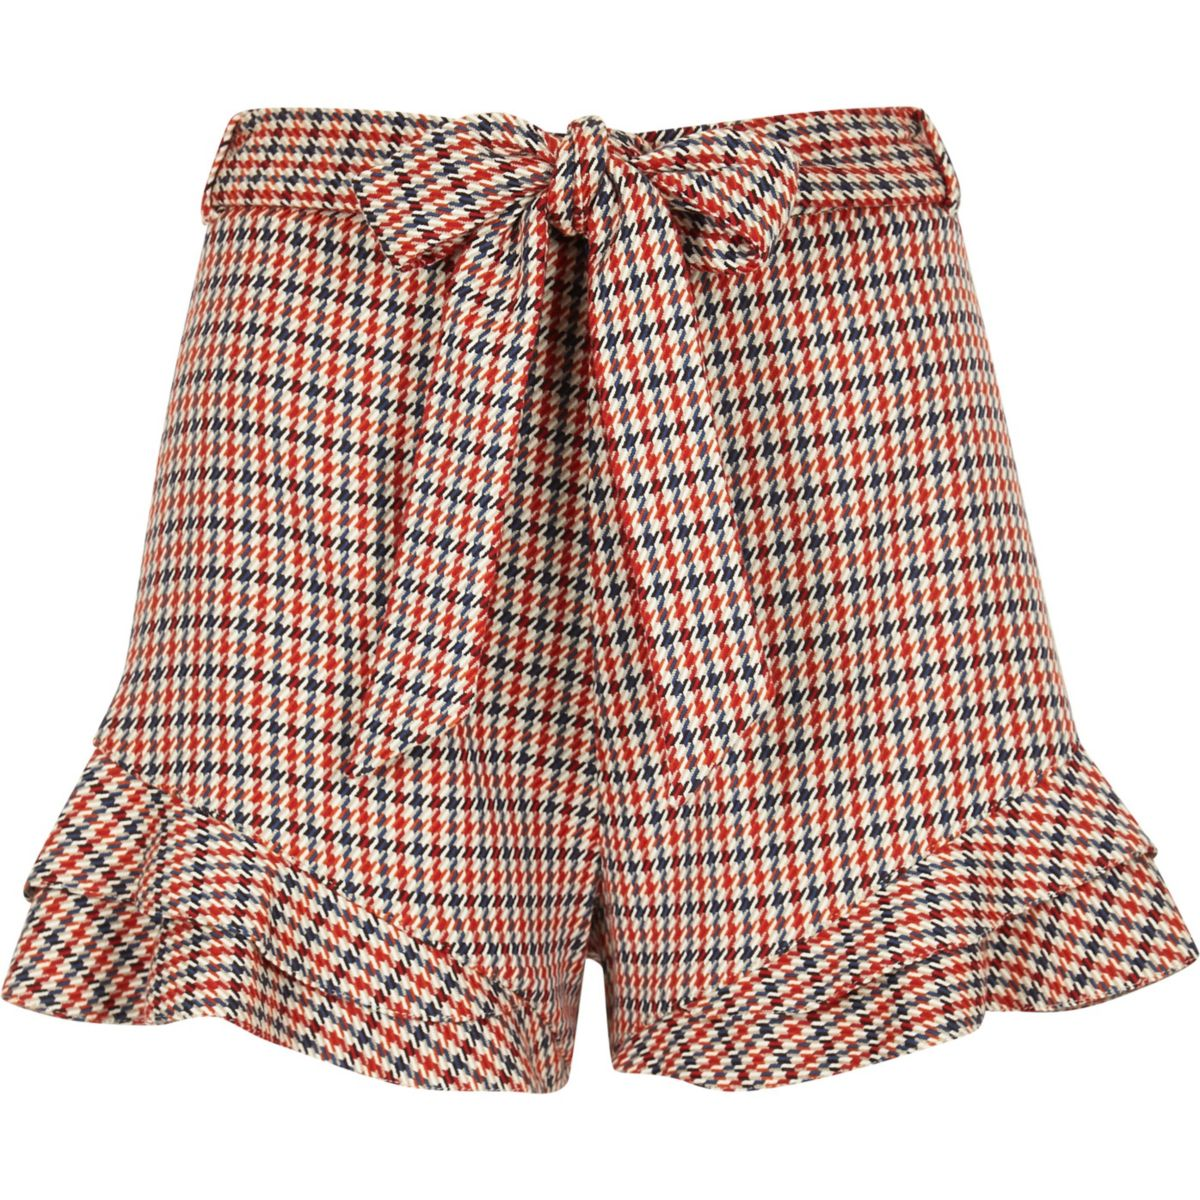 waist Orange frill check tie shorts hem wnCqgCU8